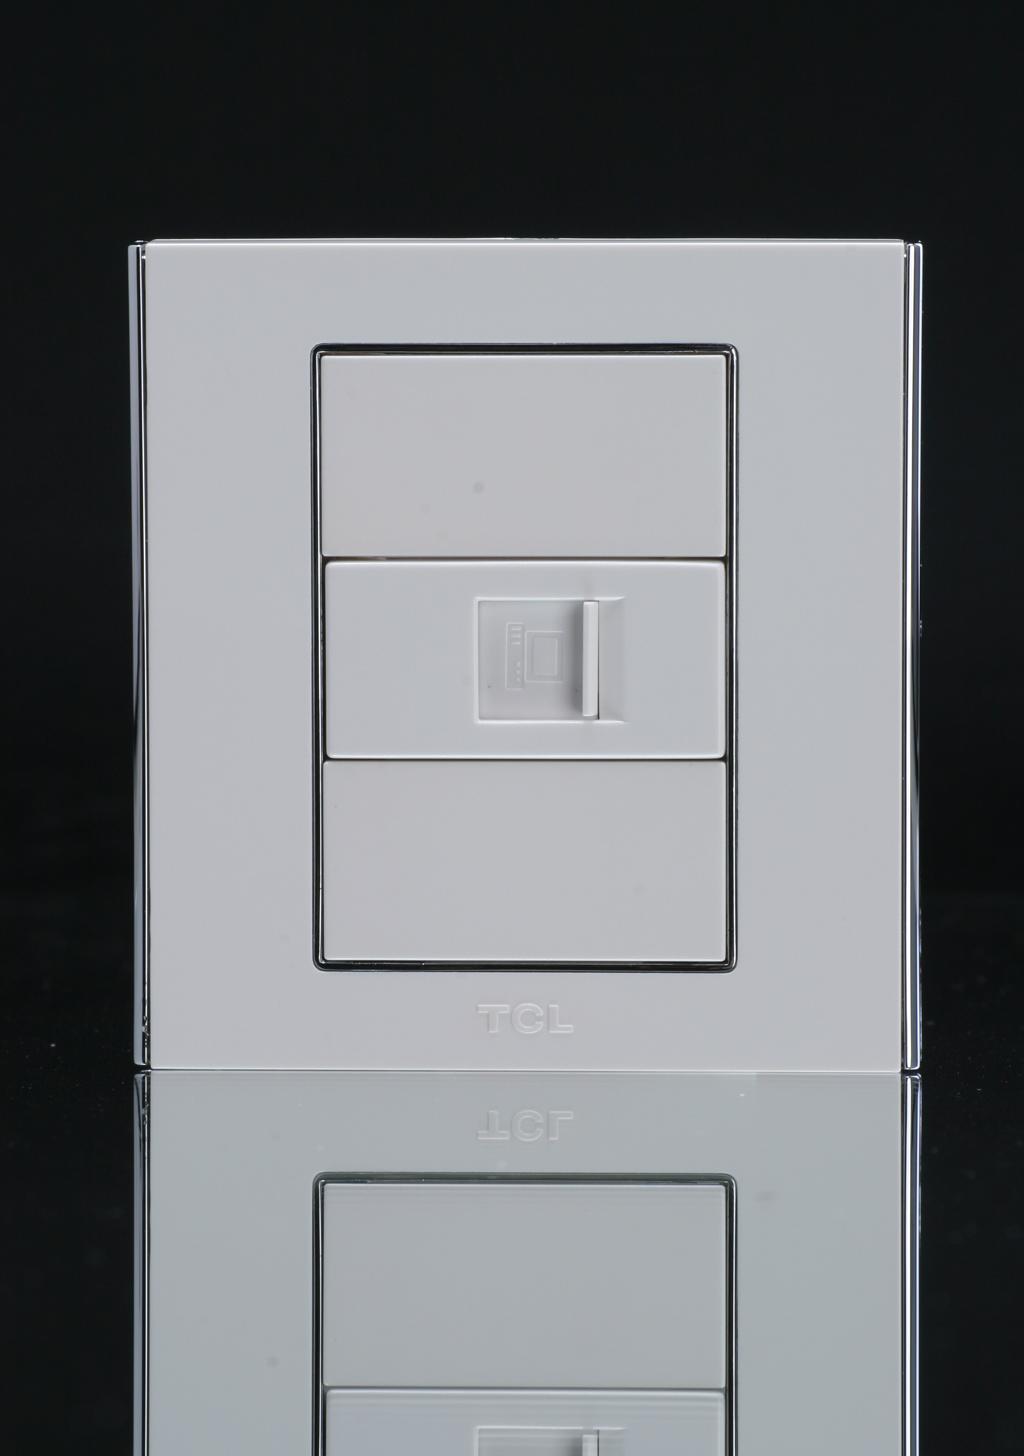 TCL-罗格朗插座A8系列A8电脑插A8/C01/1